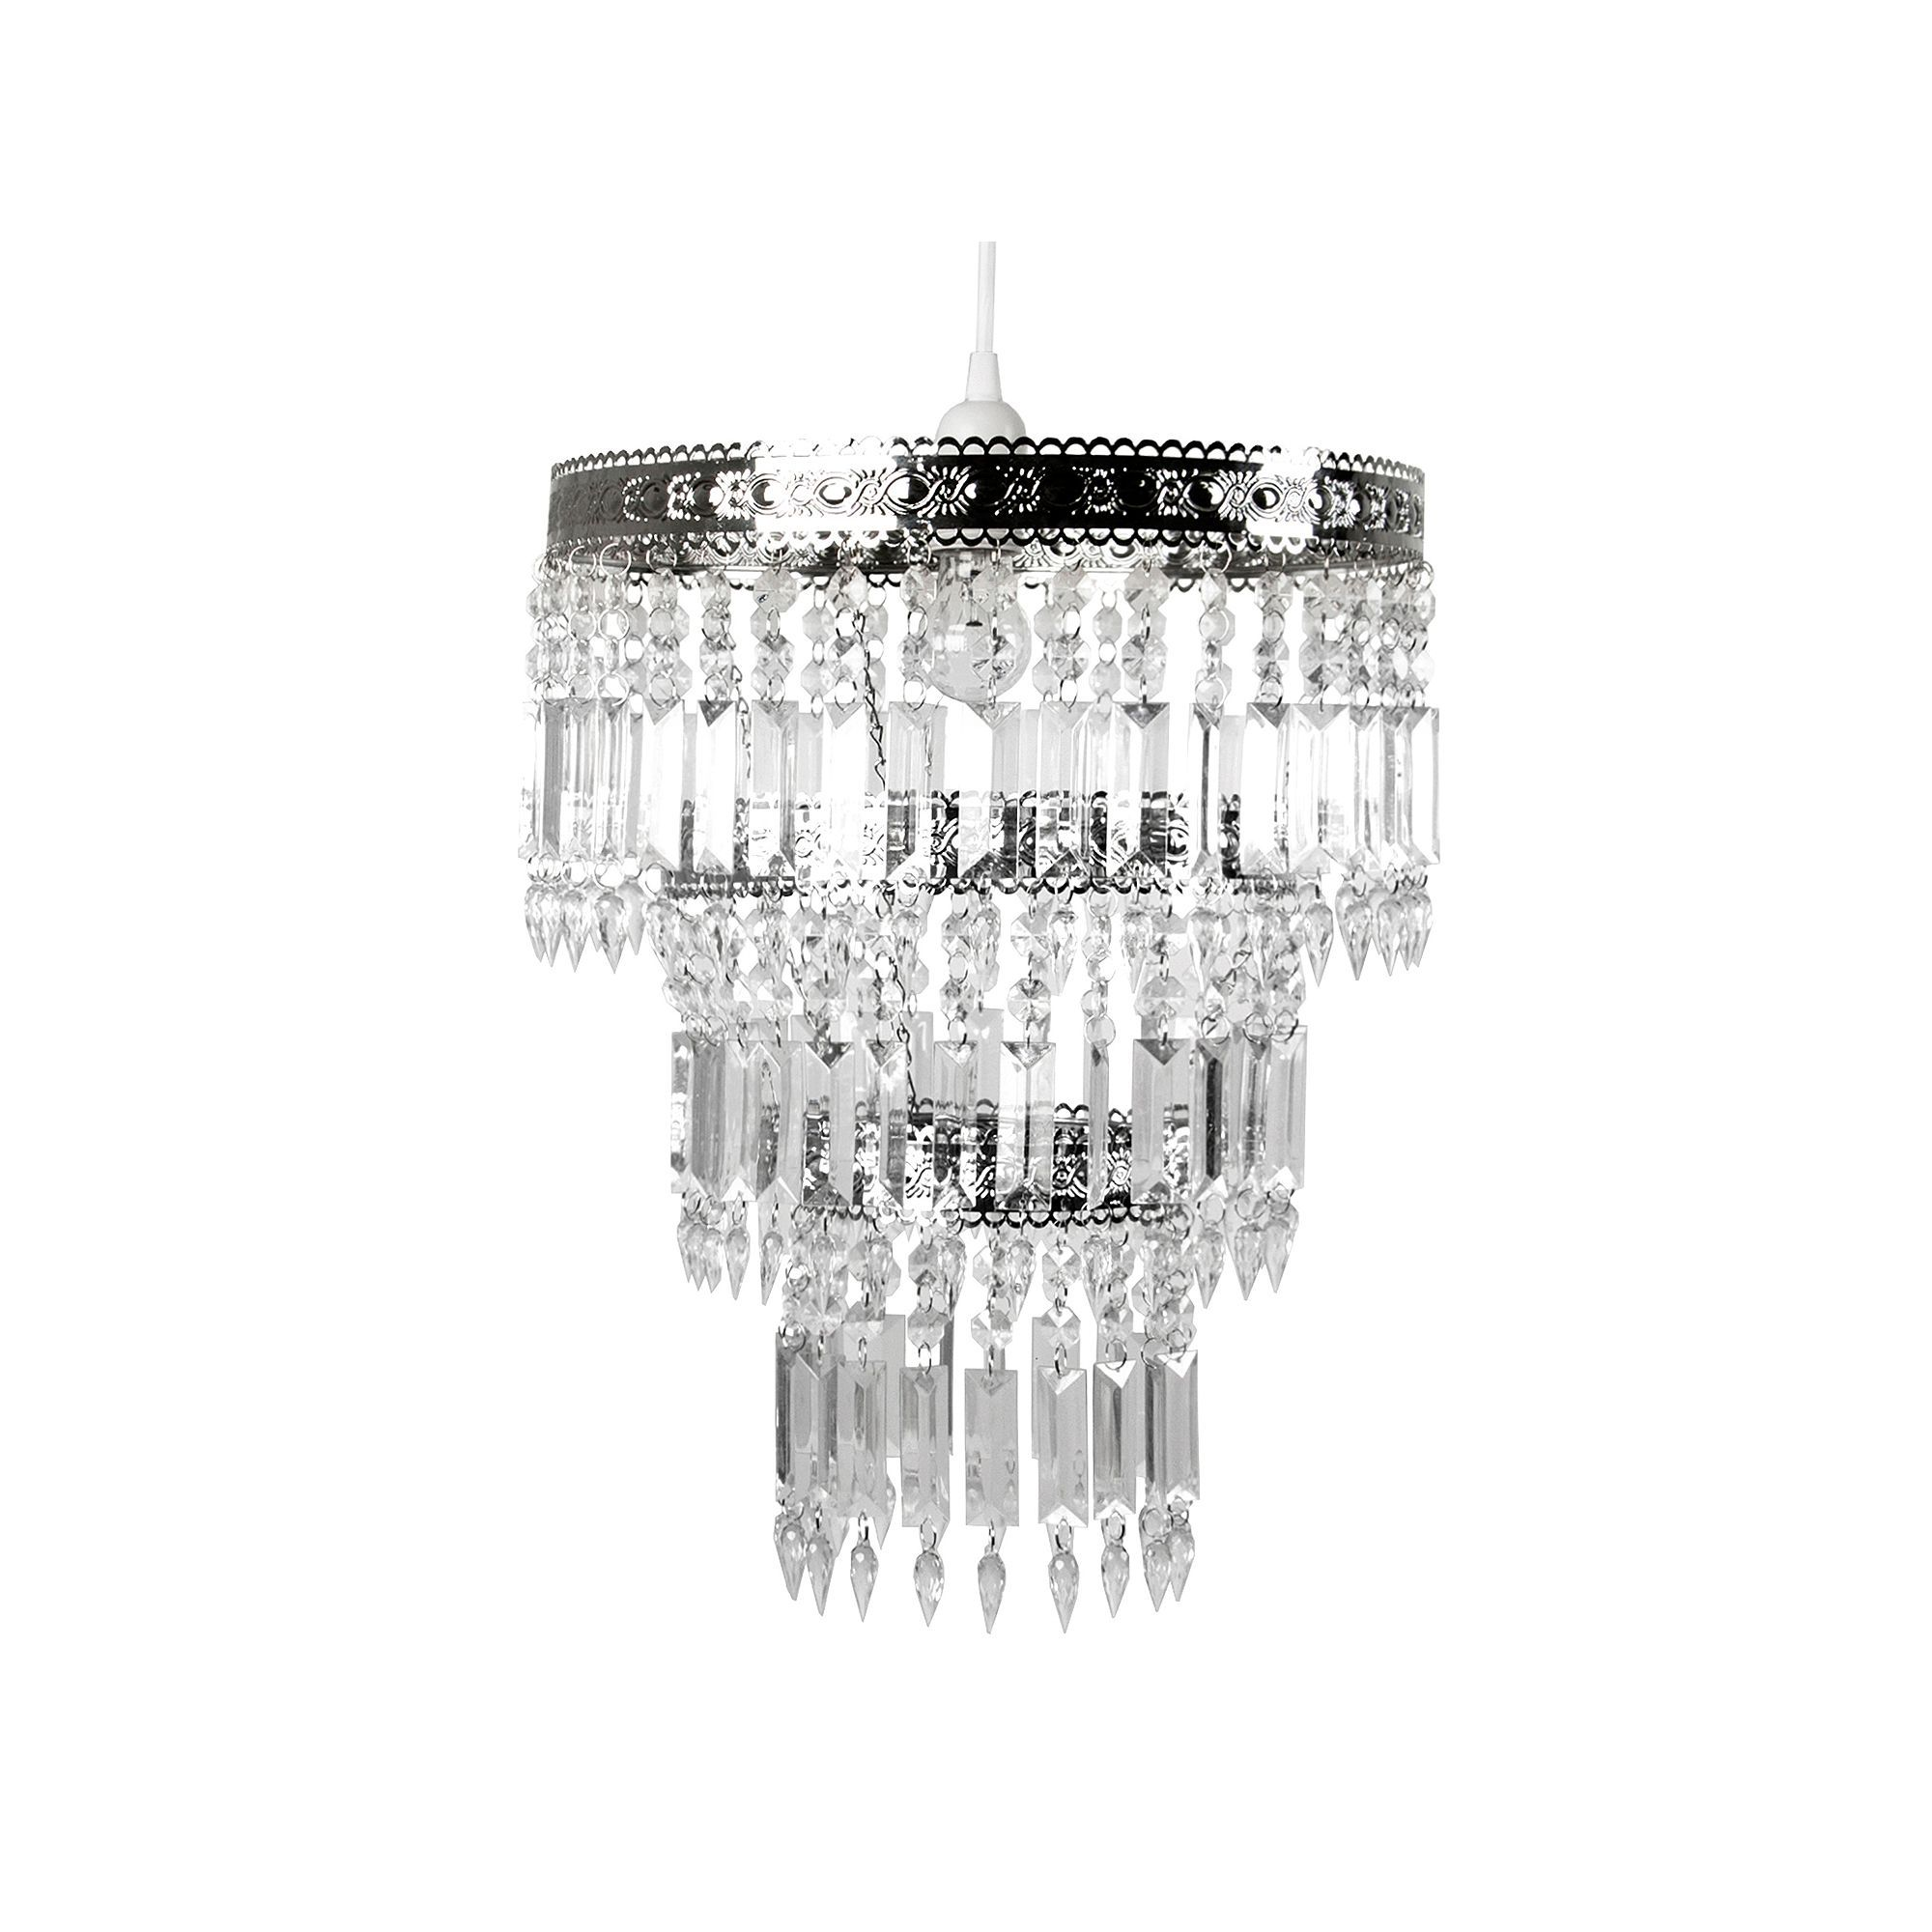 Tadpoles Large Faux Crystal Chrome Queen S Crown Pendant Chandelier Light Fixture Shade Light Shades Pendant Light Fixtures Beaded Chandelier